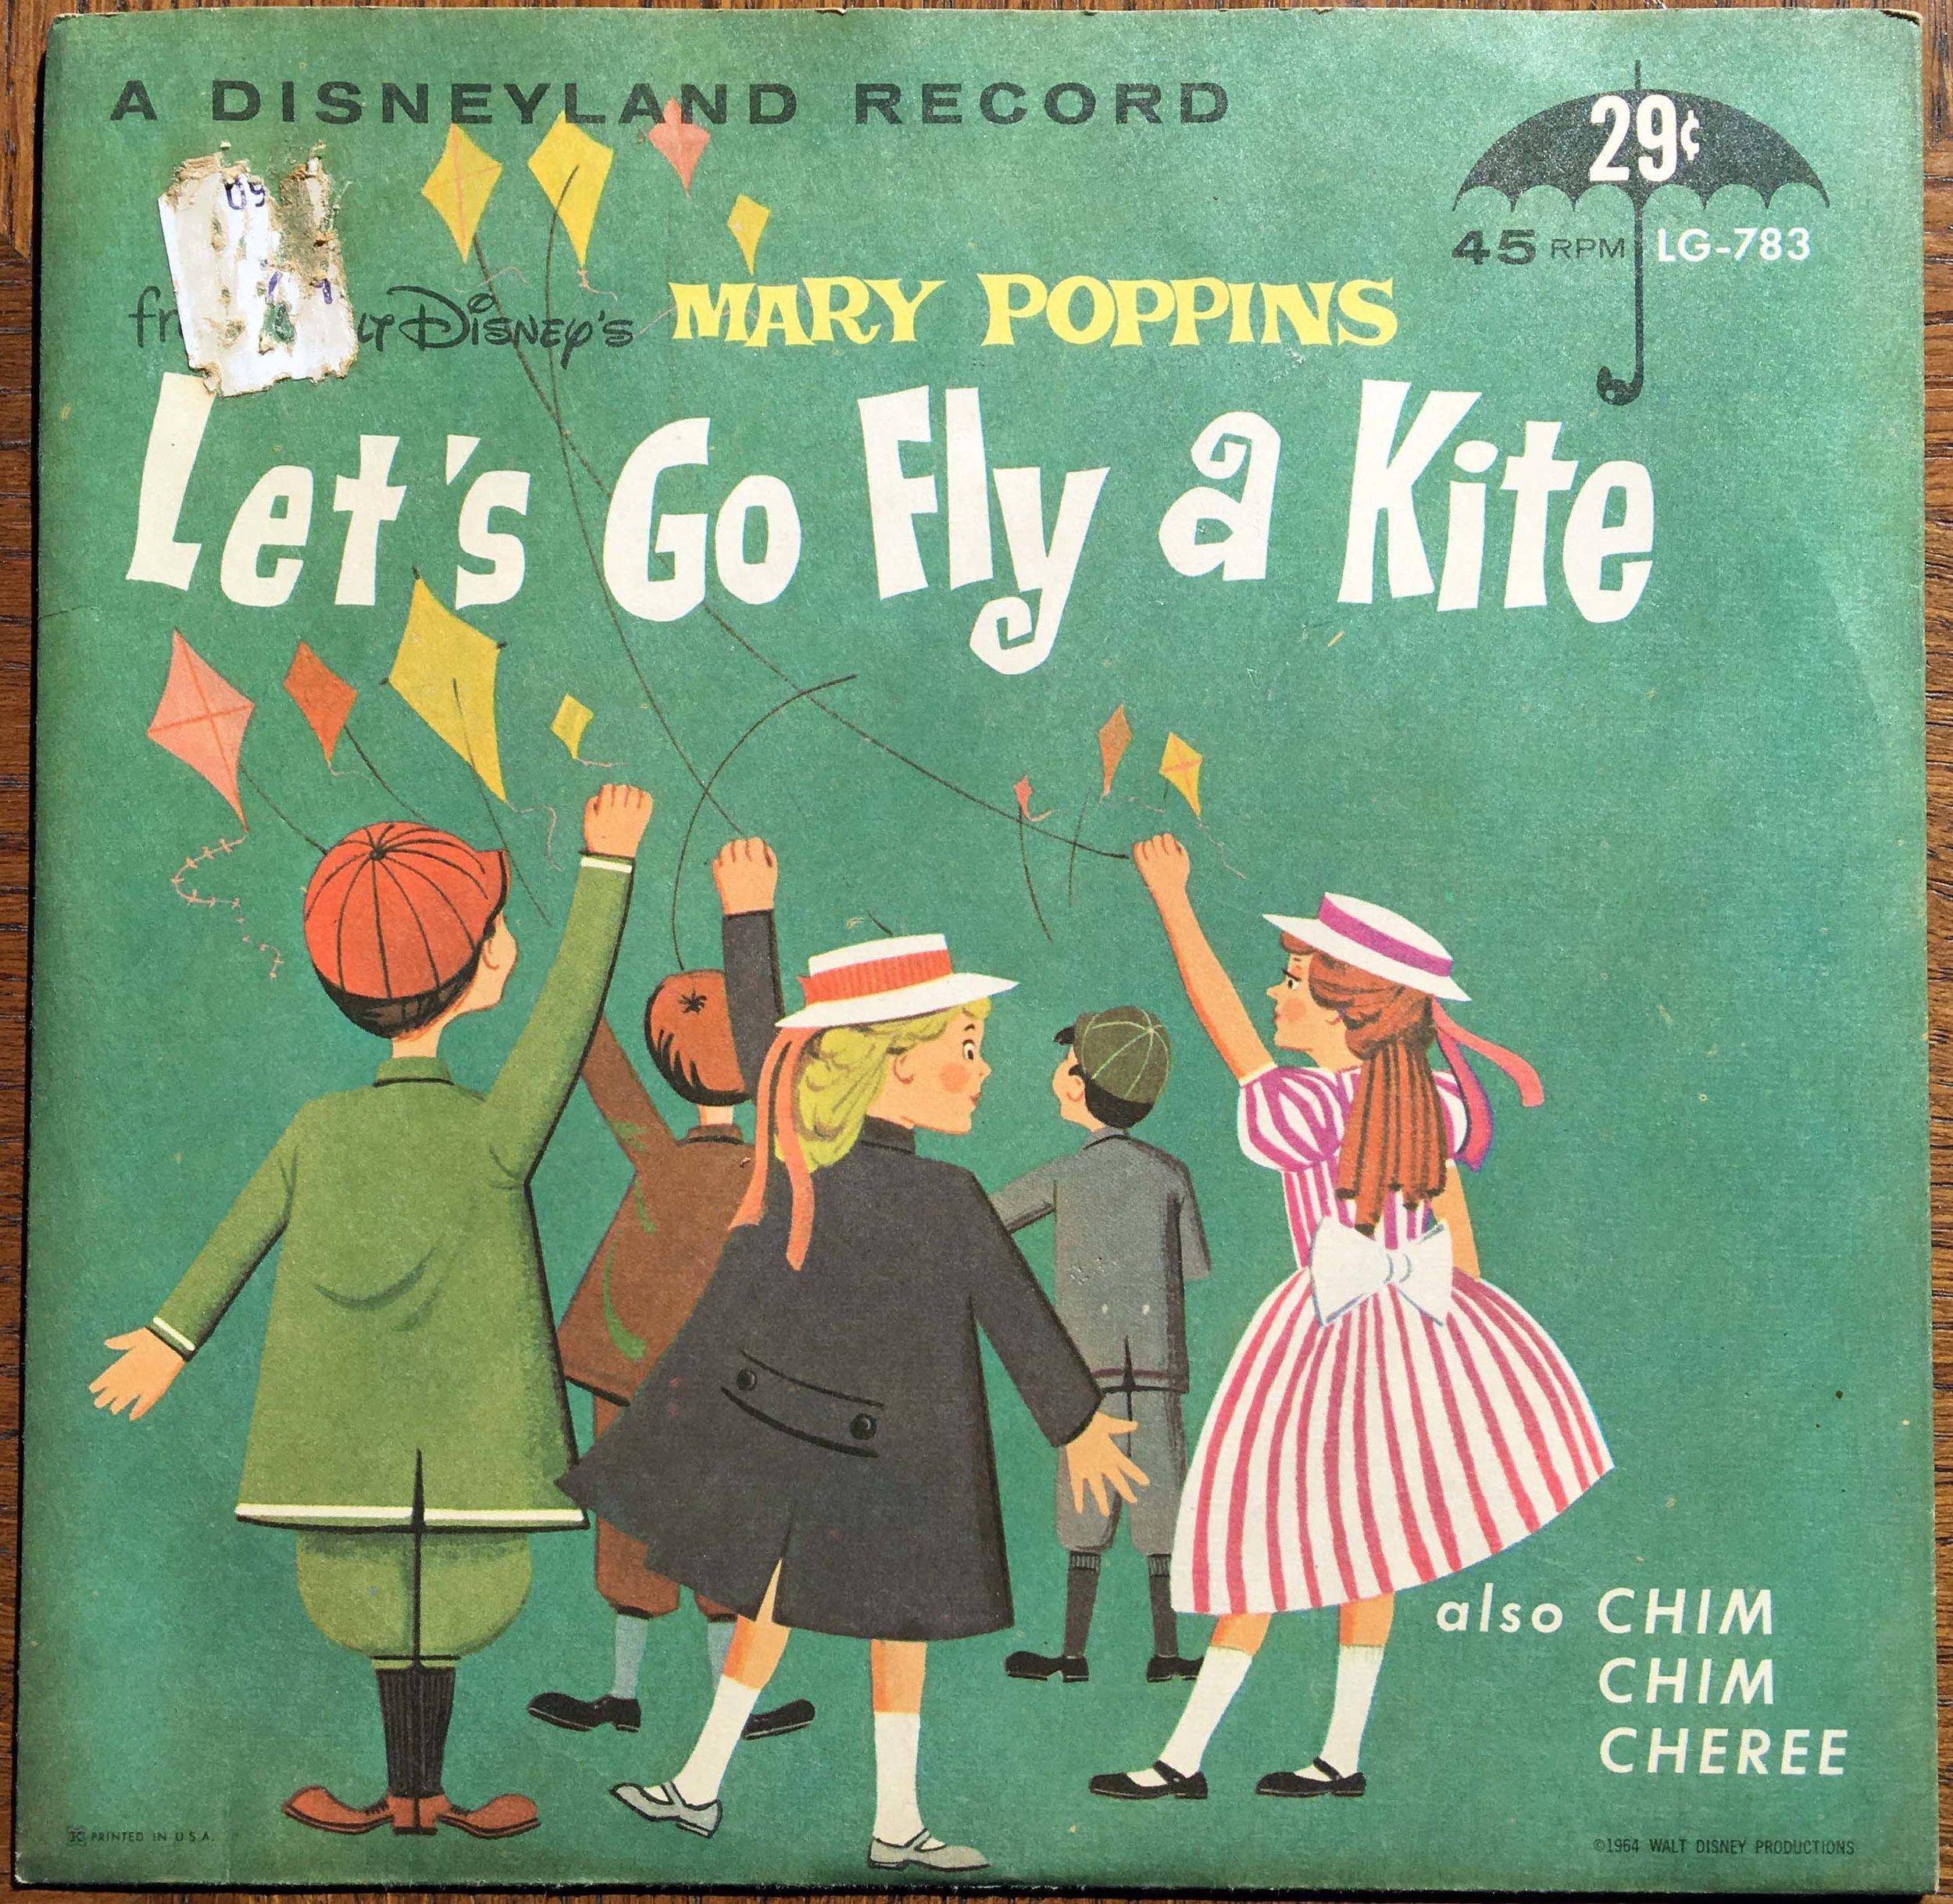 Let's Go Fly a Kite - MARY POPPINS